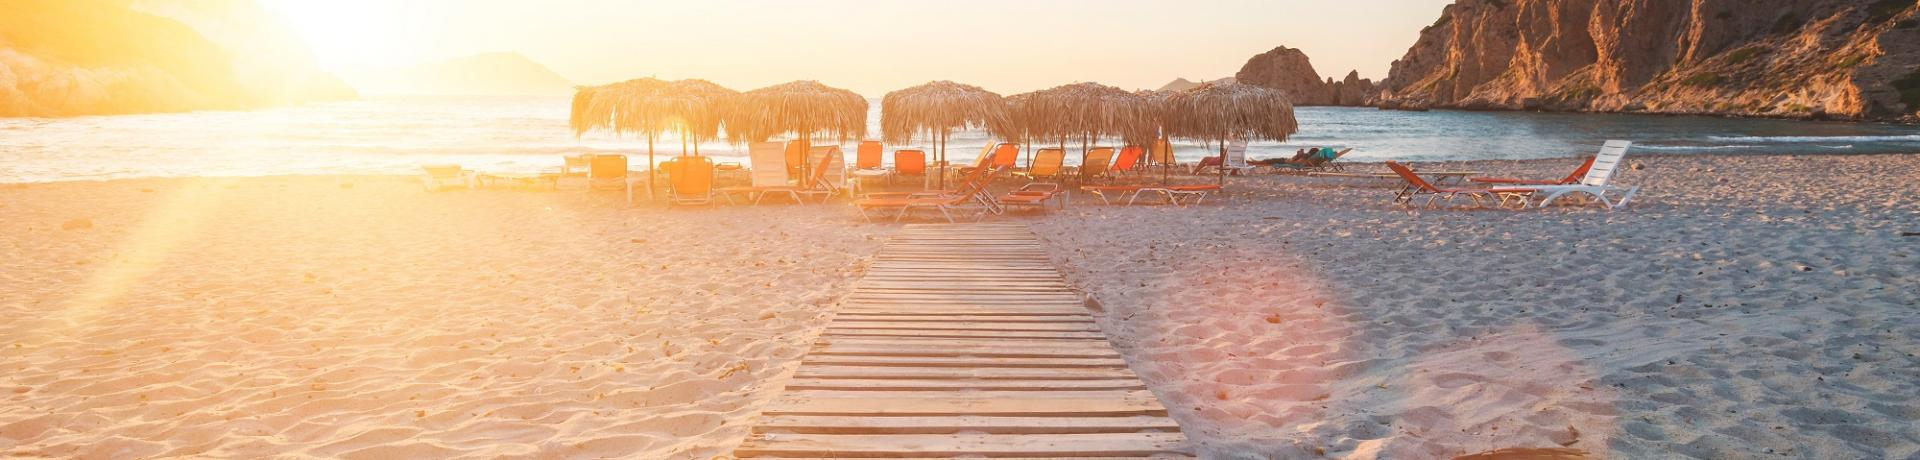 Griechenland-Milos-Strand-Emotion_GI-943831800.jpg